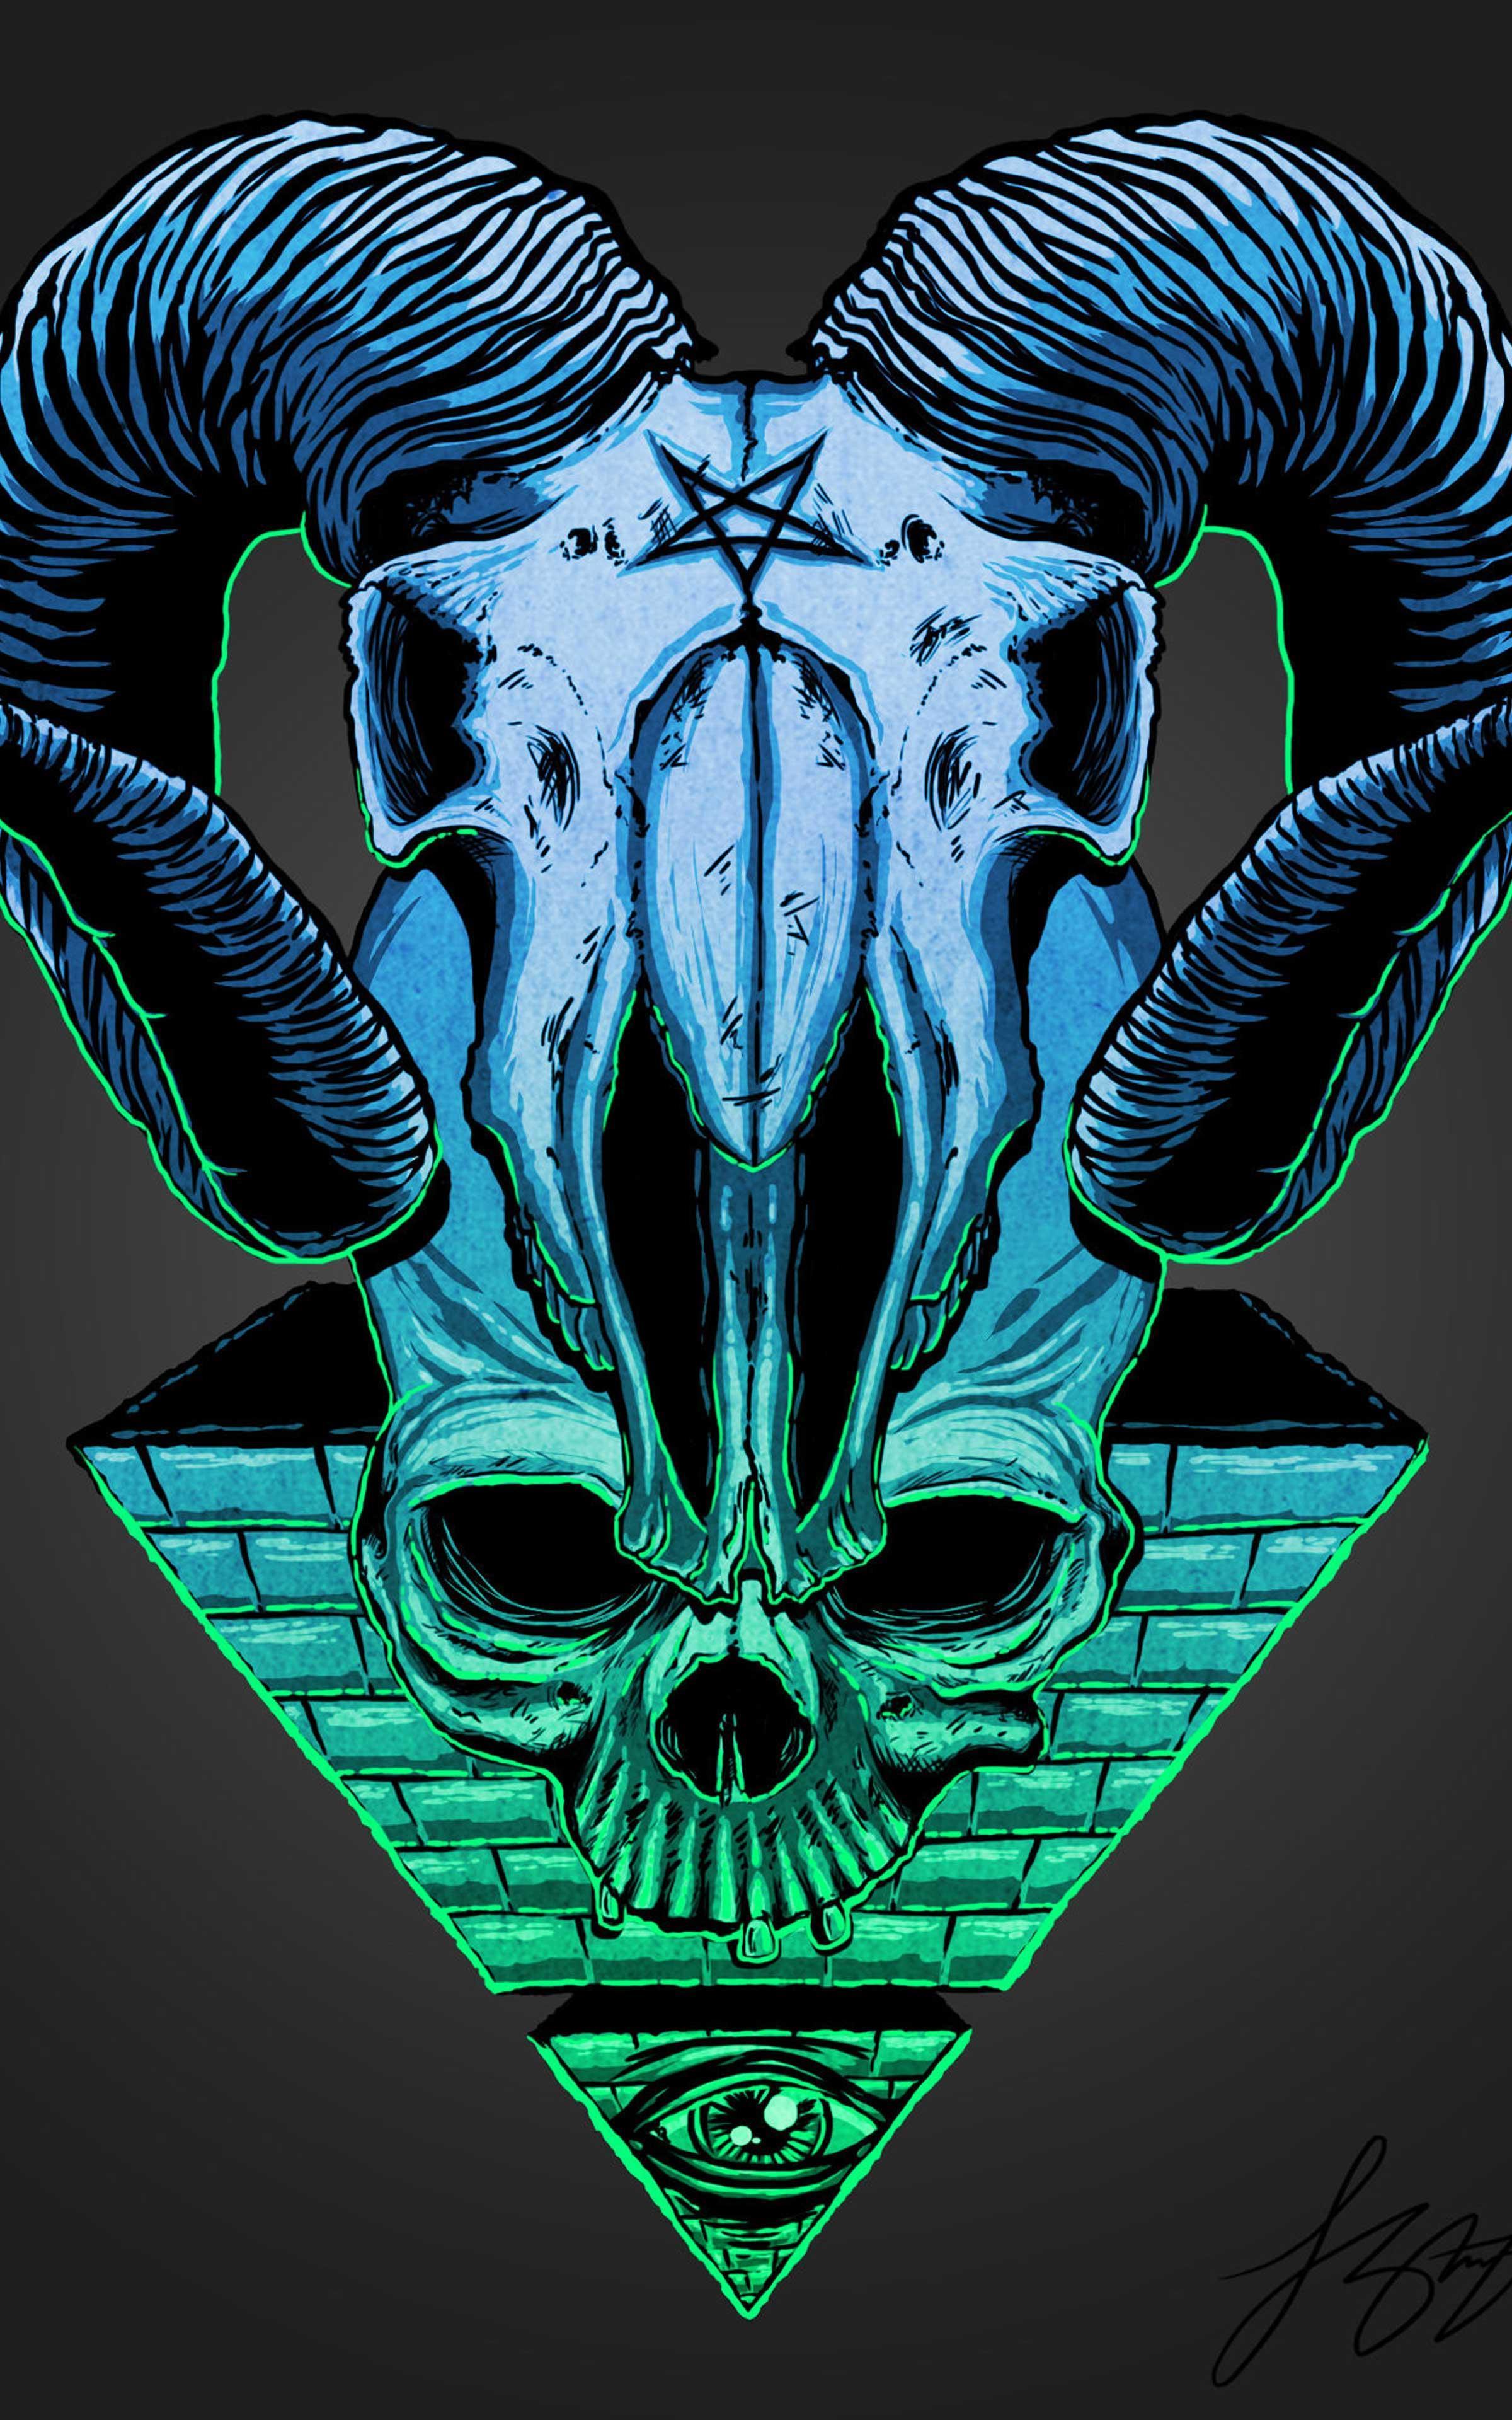 Illuminati Best Illuminati Wallpaper 1920x1080 For Android